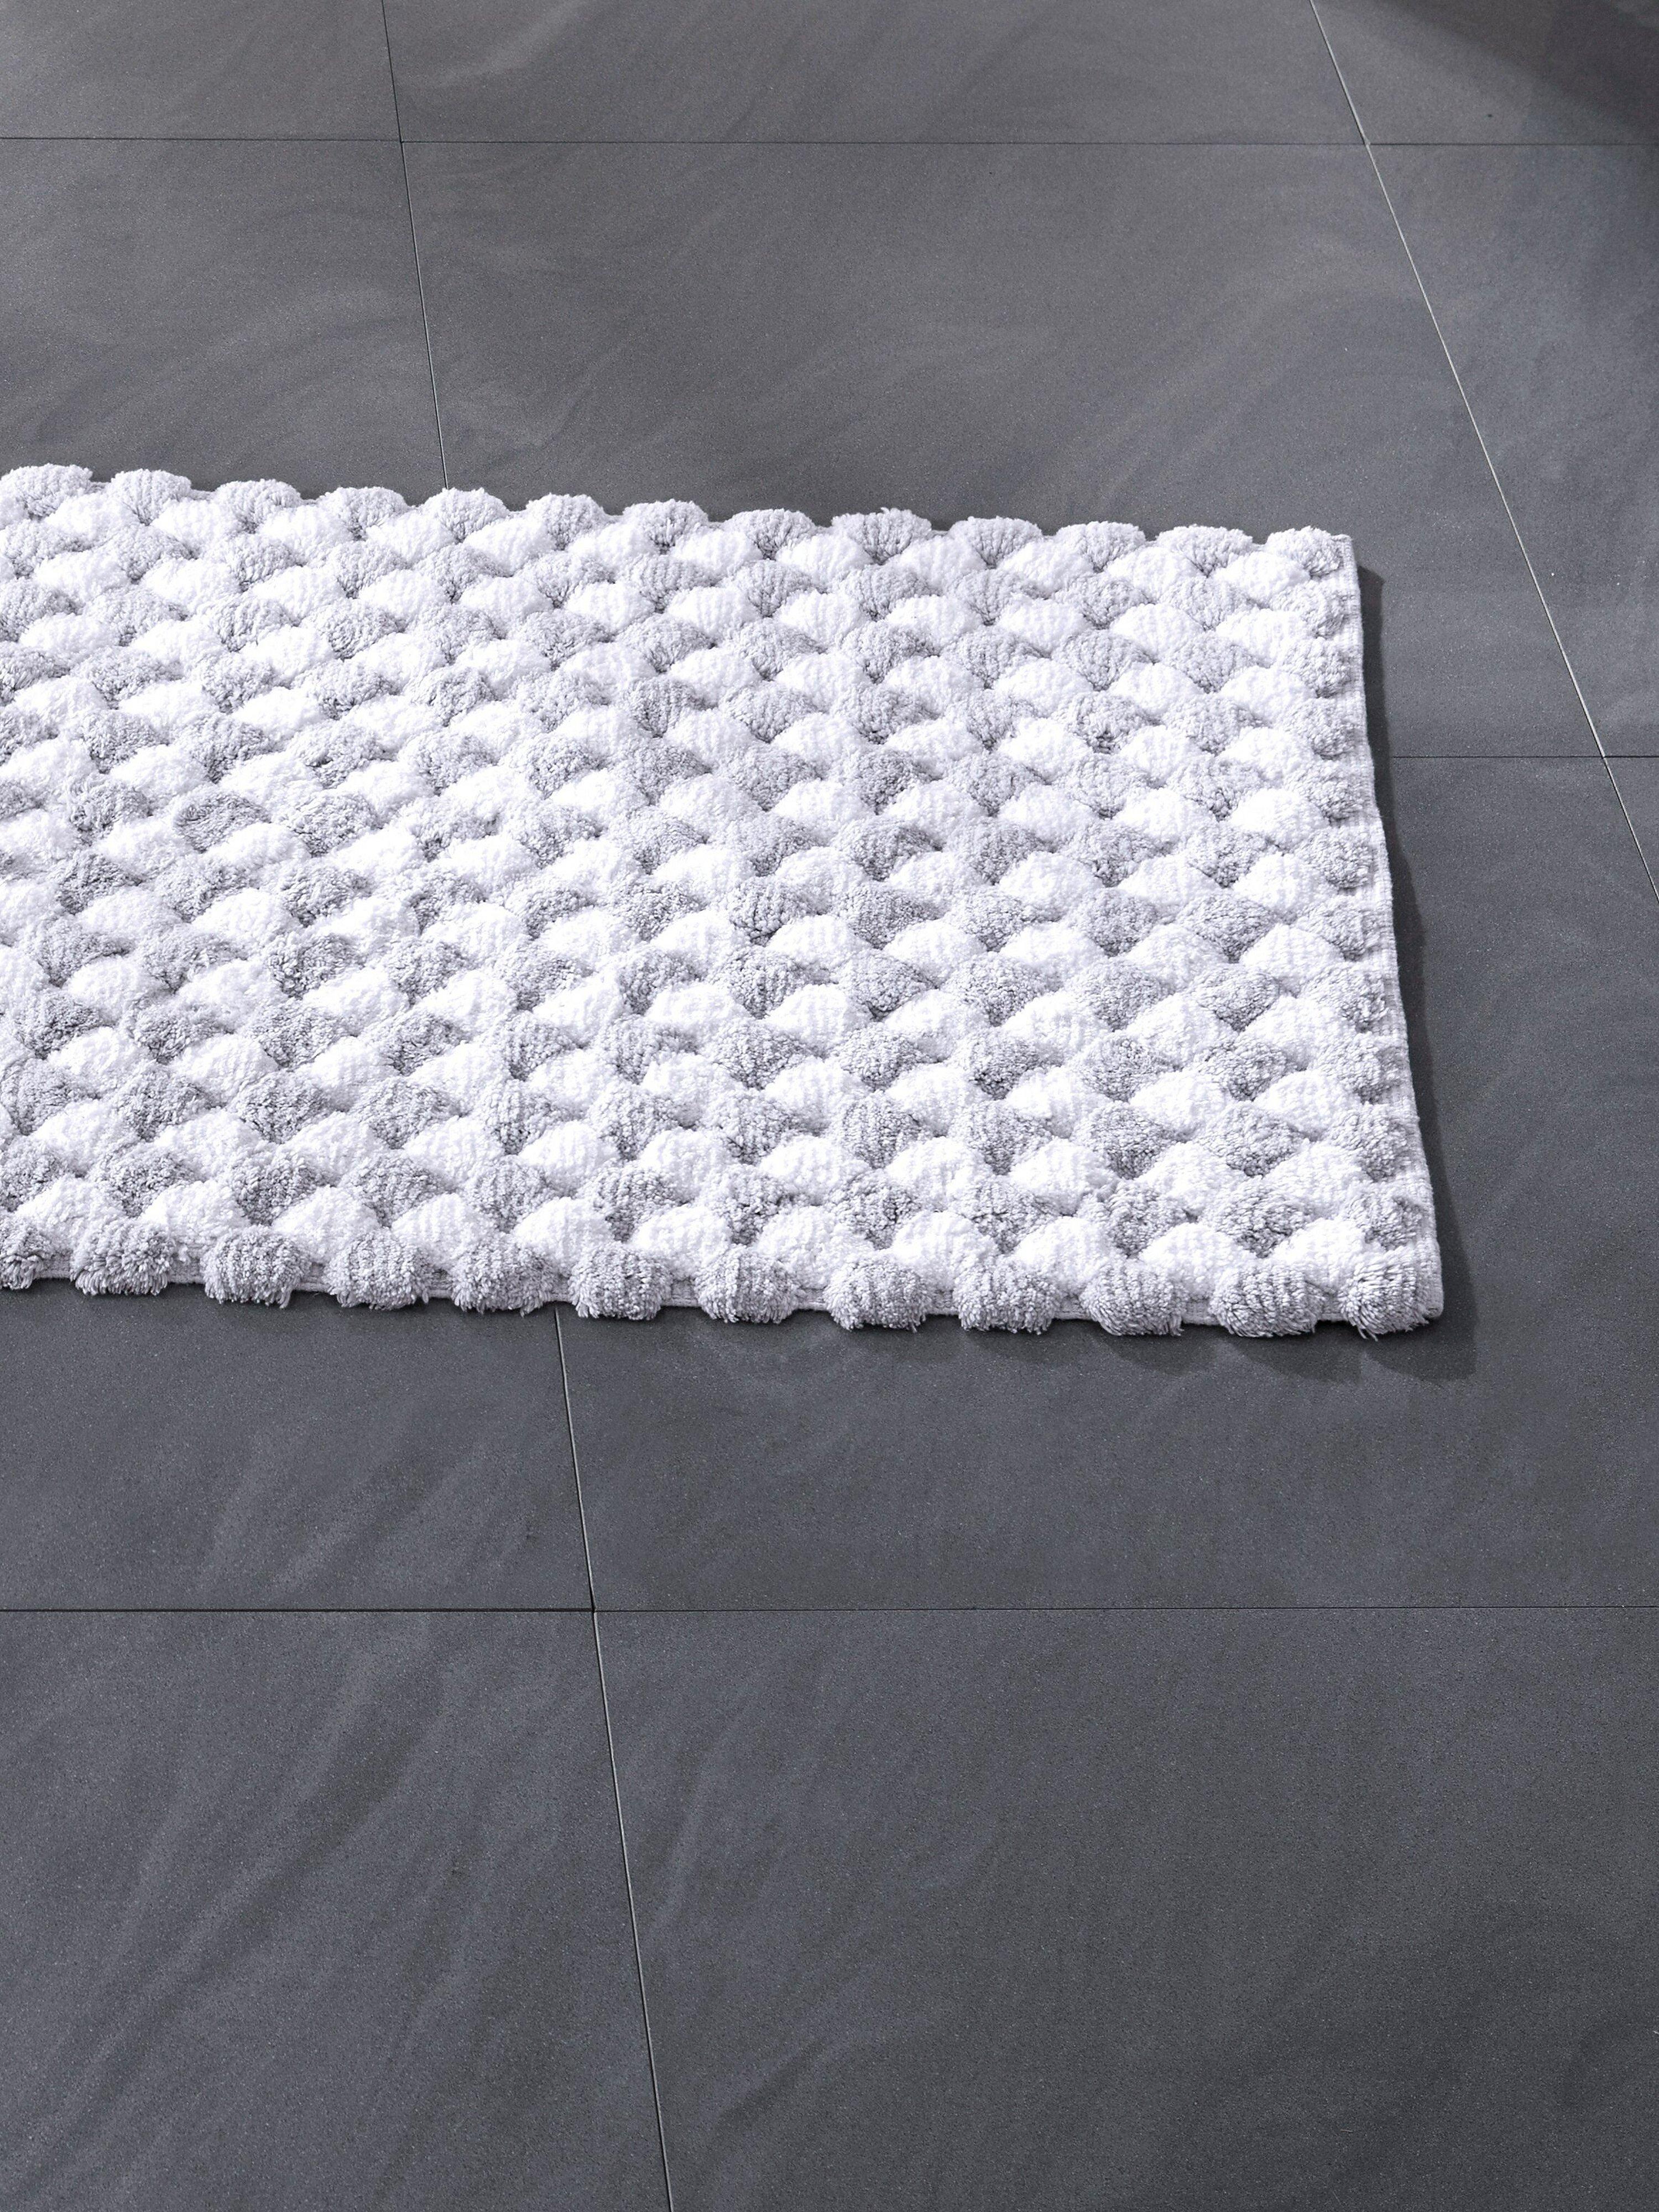 Badmat, ca. 70x120cm Van Kleine Wolke zilverkleur